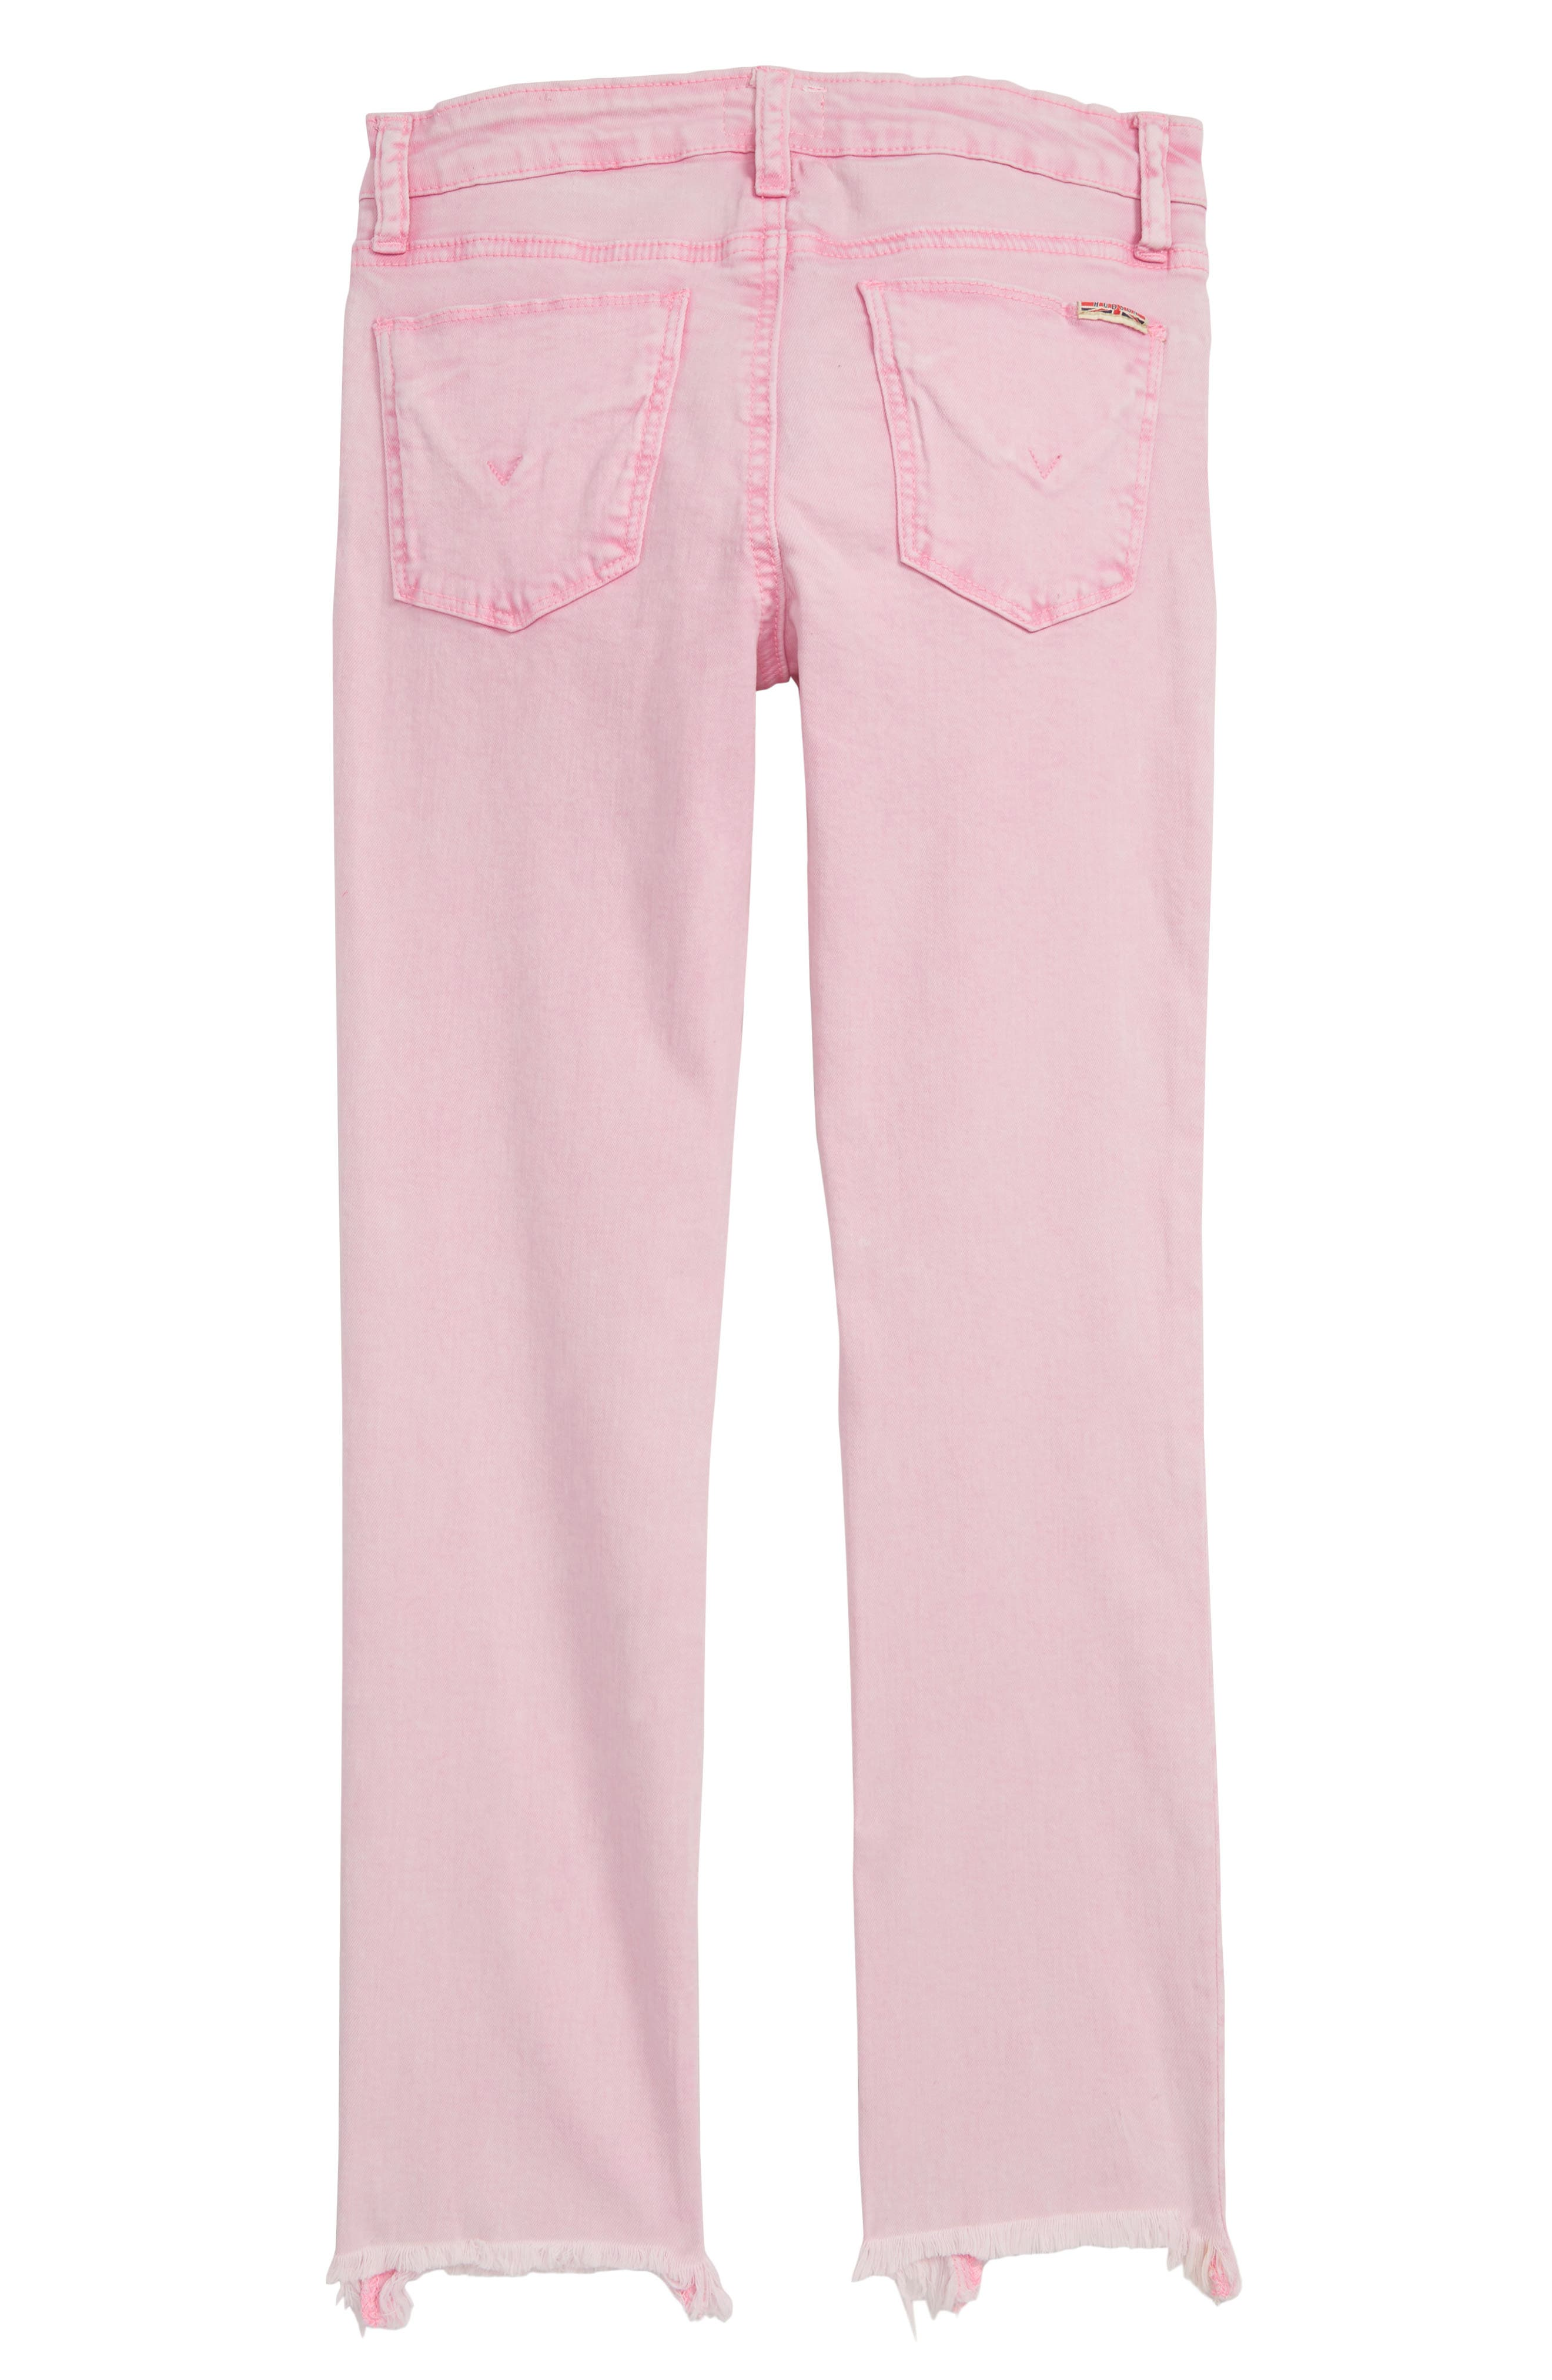 Wren Skinny Jeans,                             Alternate thumbnail 2, color,                             WATERMELON